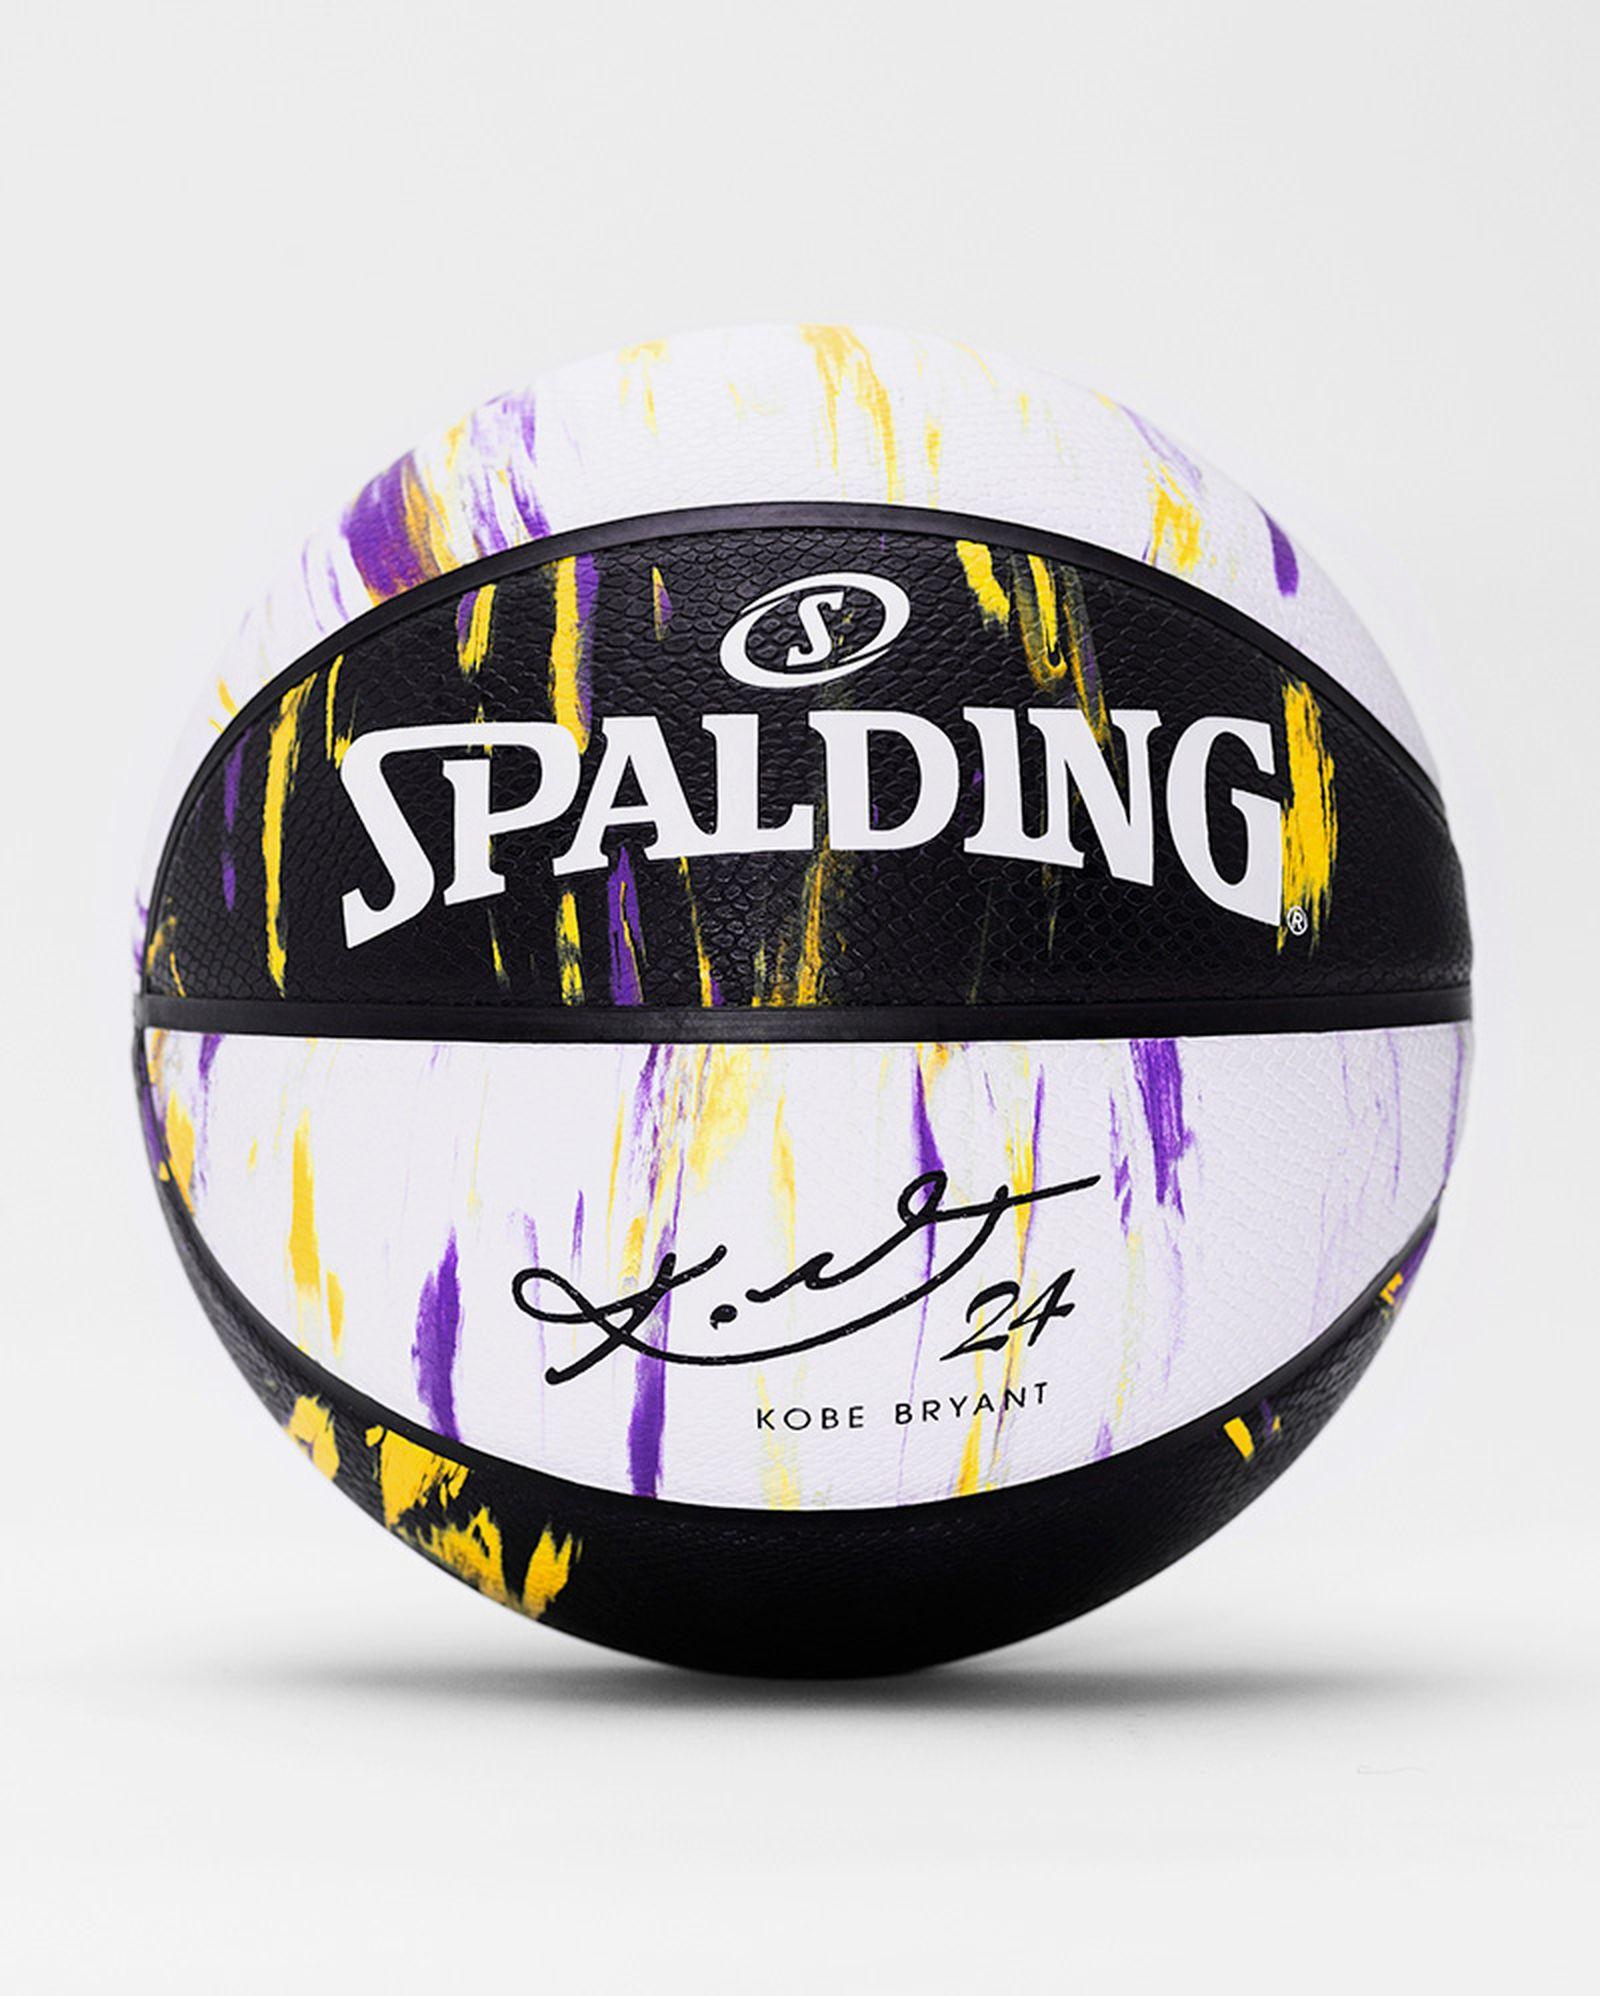 spalding-kobe-bryant-marbled-snake-basketball-02